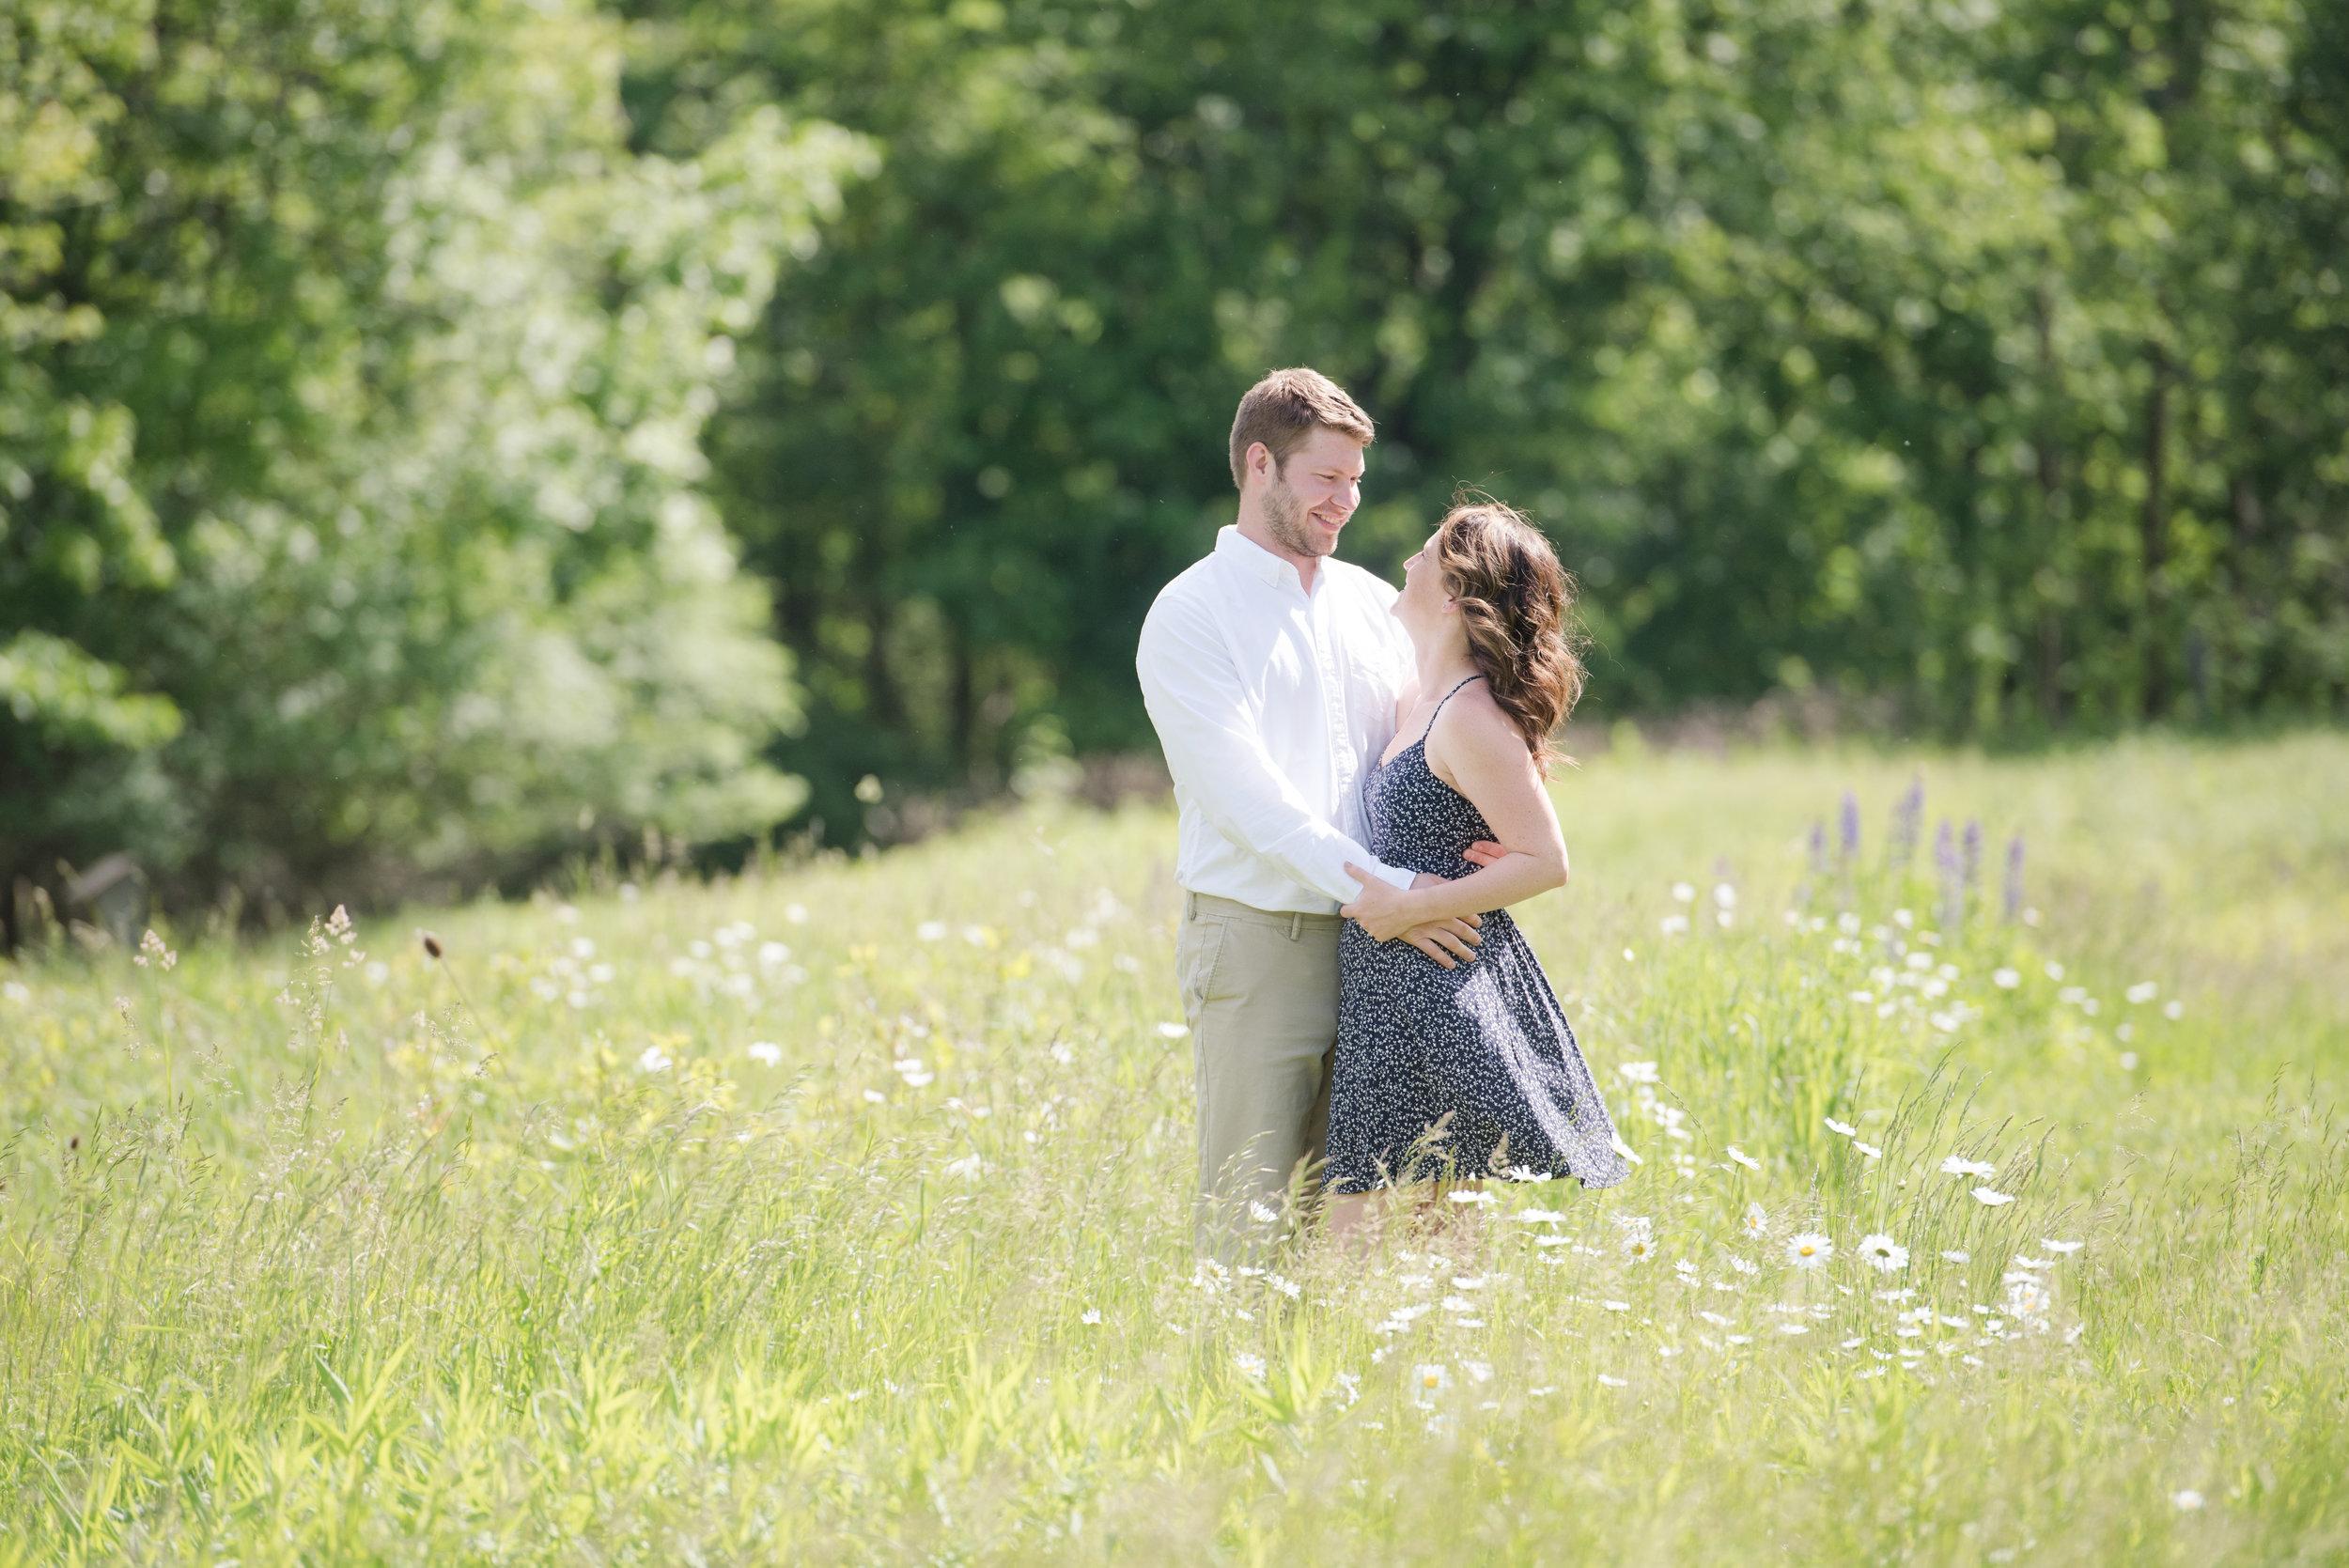 GALLERY-2019-6-9 Kaitlin, Justin & Liam Engagement 0532 63.jpg